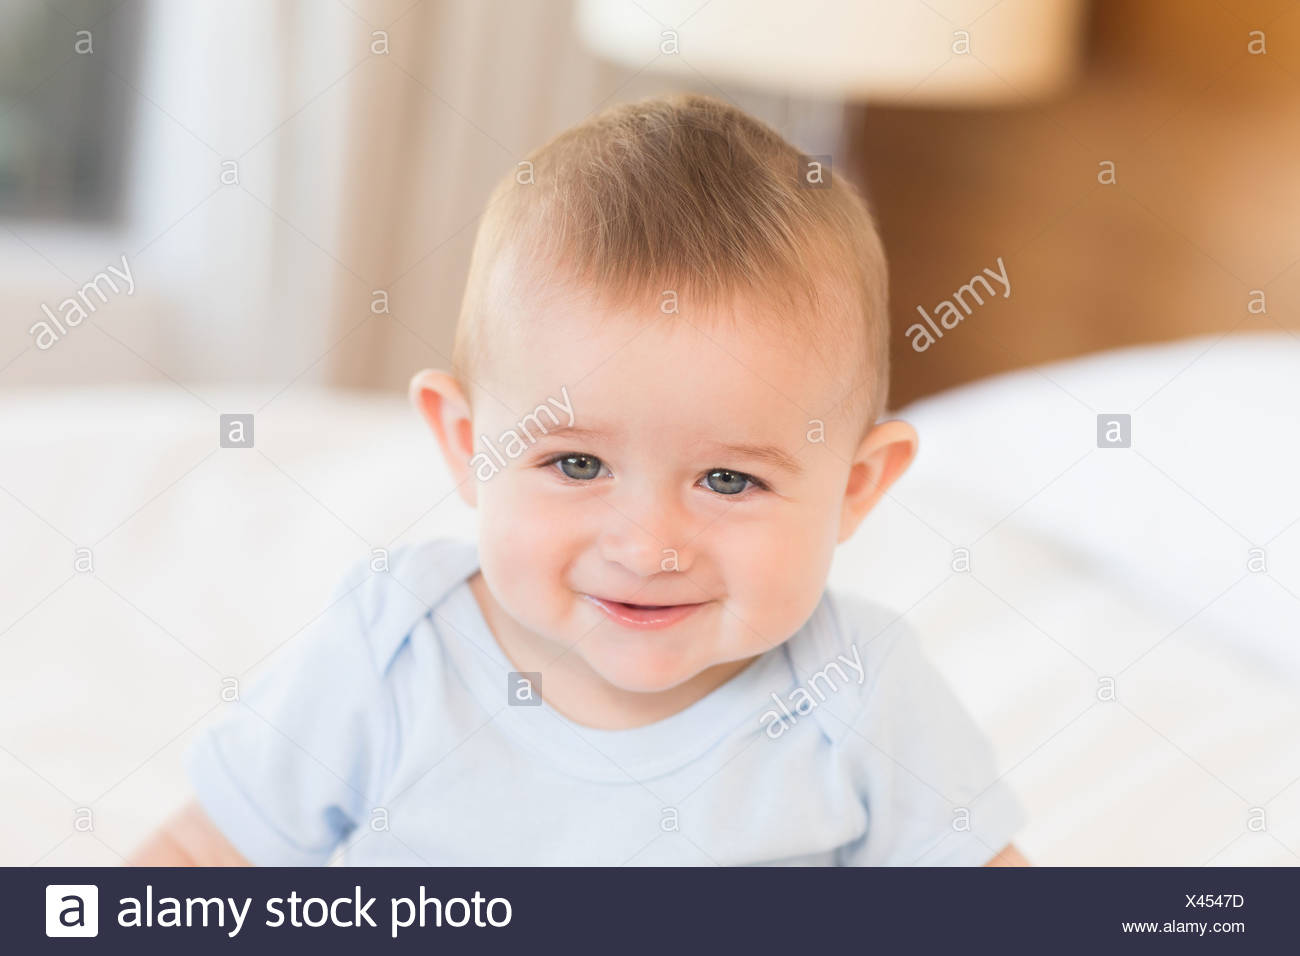 Baby boy in blue babygro - Stock Image